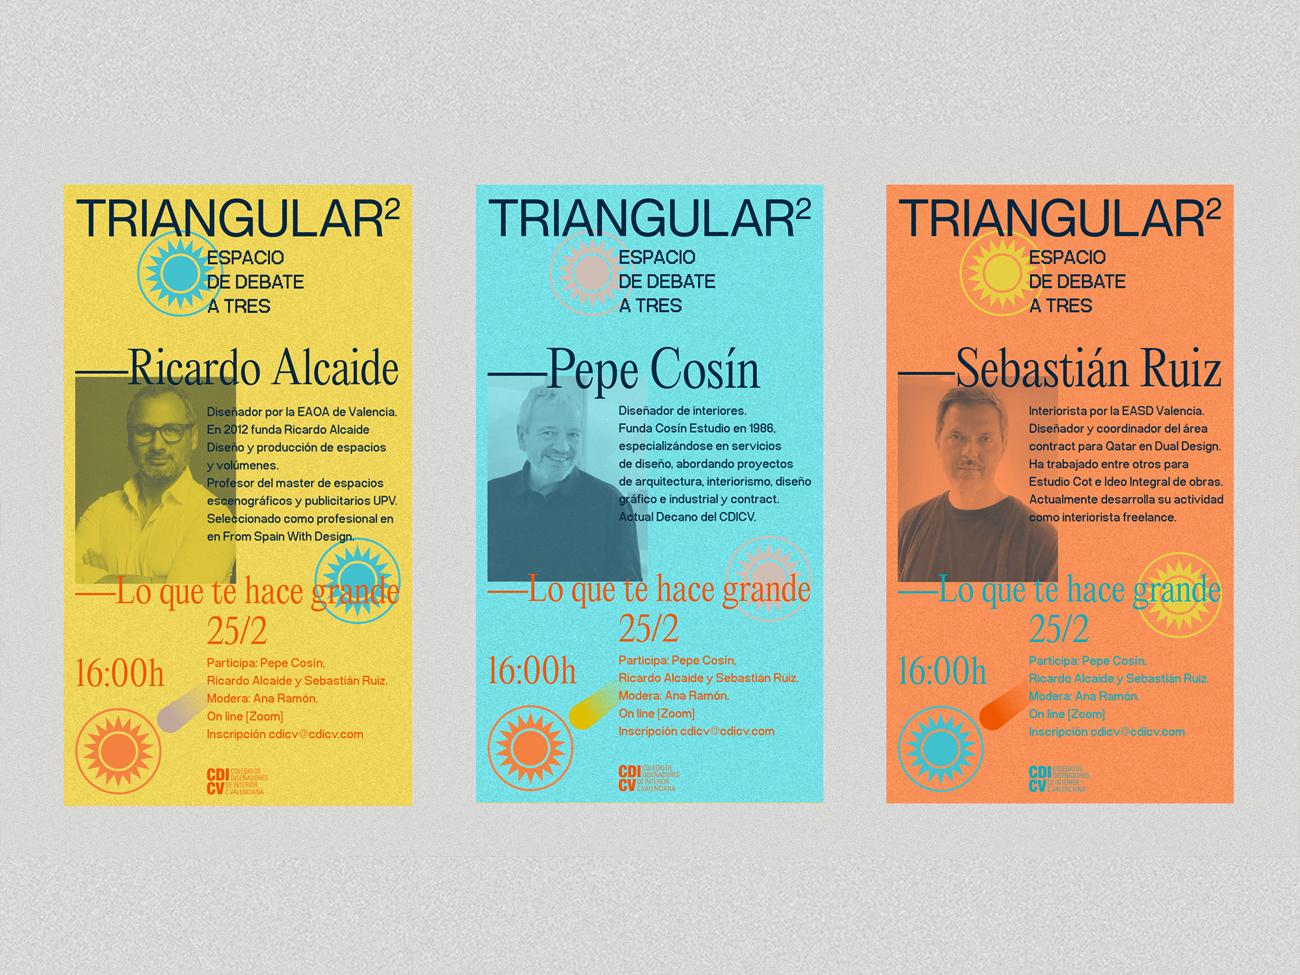 TRIANGULAR CDICV_3